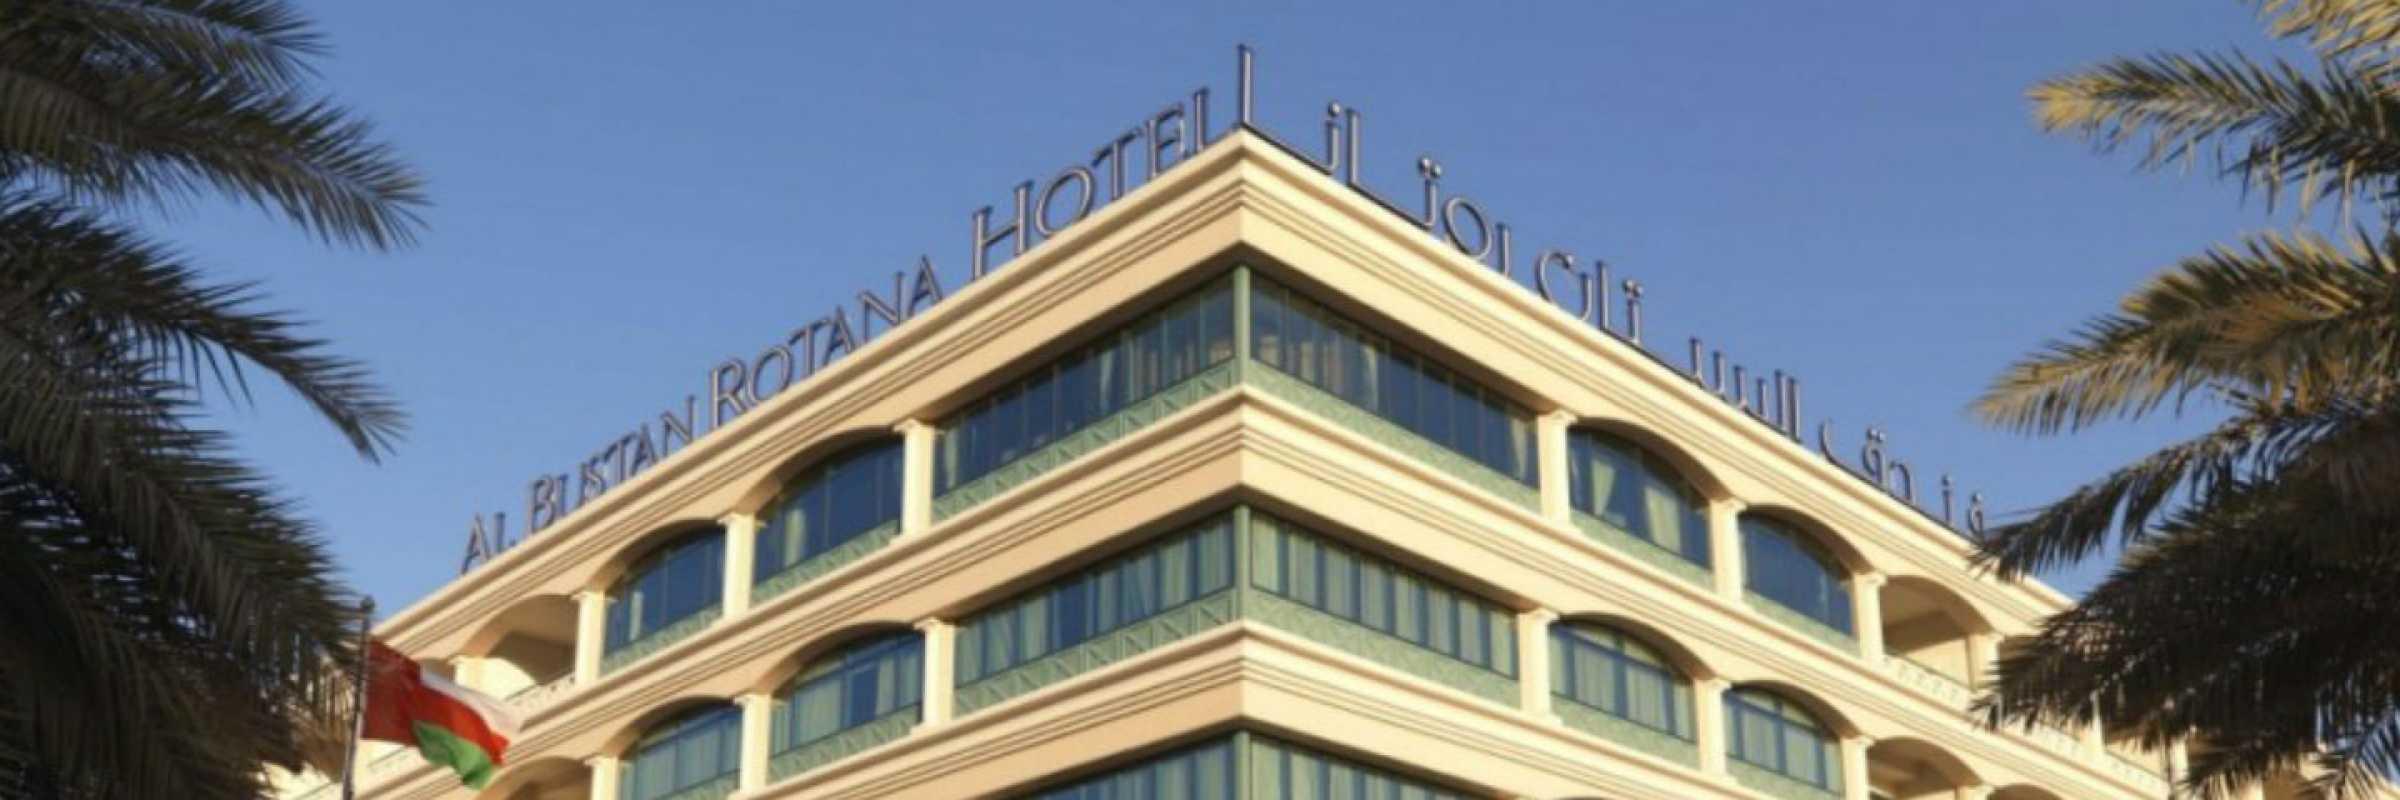 Al Bustan Rotana hotel, Dubai